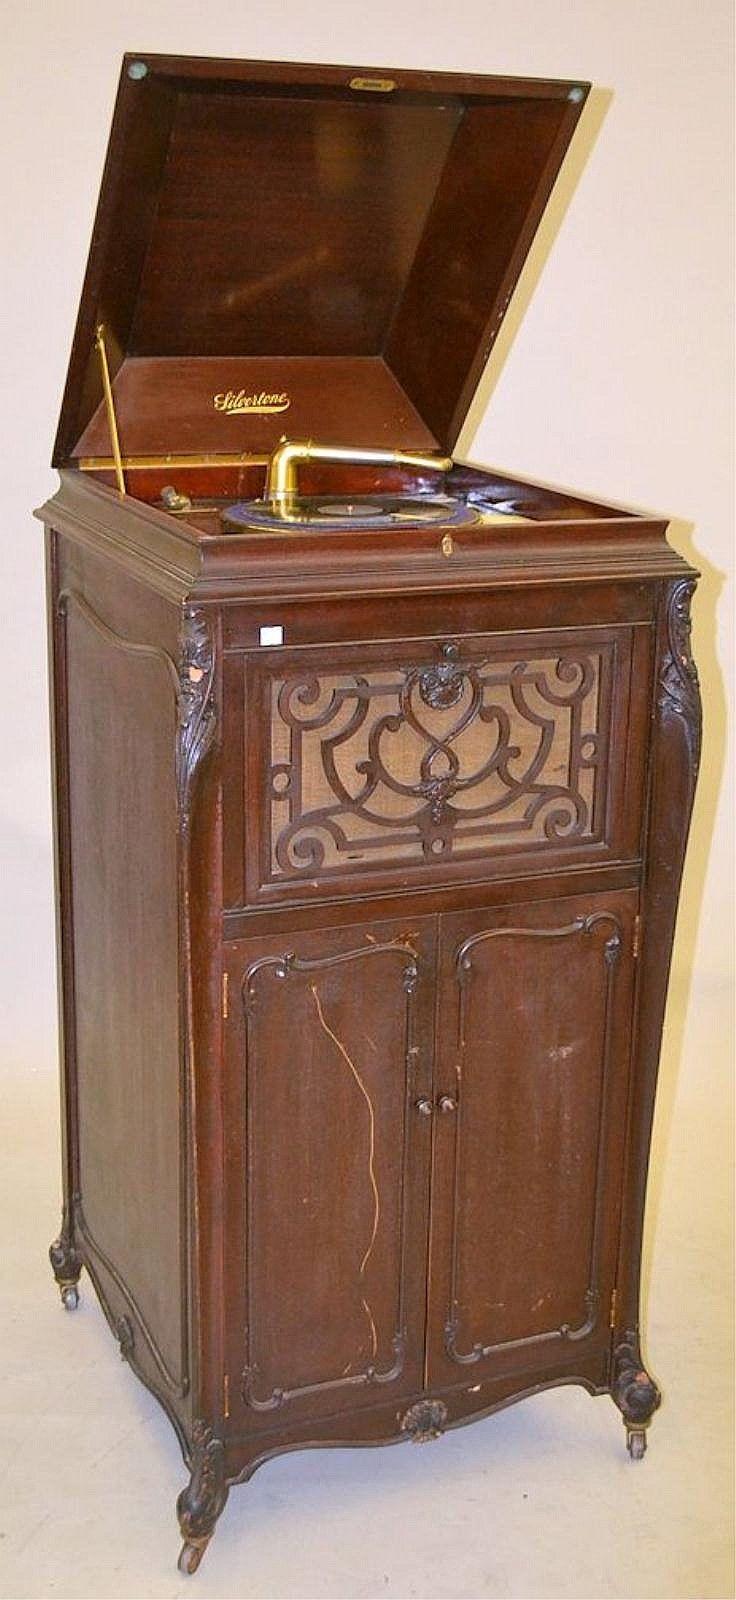 Antique Mahogany Silvertone Phonograph - Antique Mahogany Silvertone Phonograph Phonograph & Antique Music